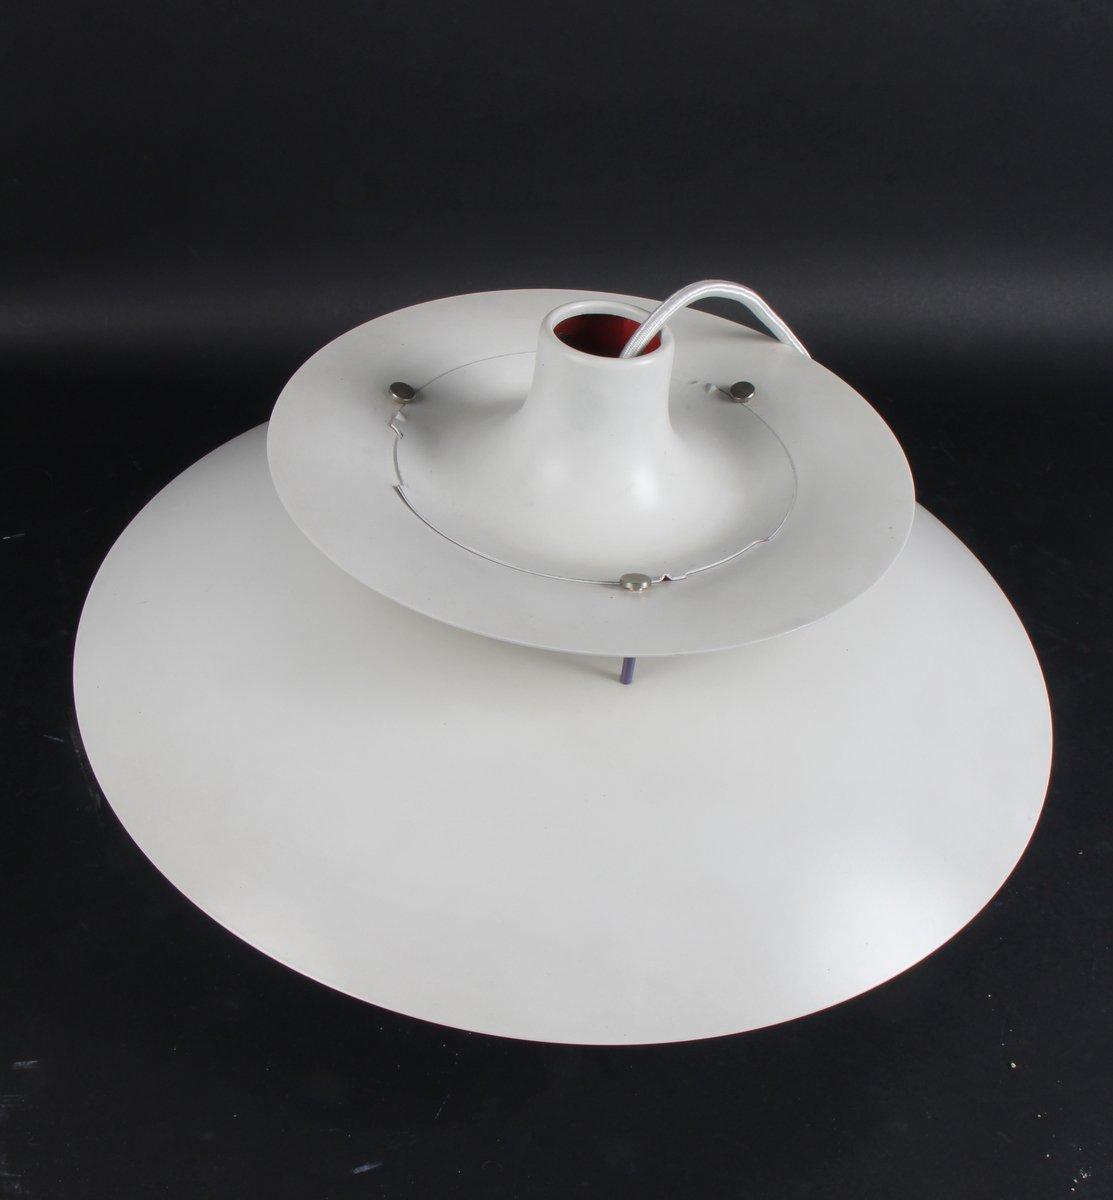 vintage ph5 suspension lamp by poul henningsen for louis poulsen for sale at pamono. Black Bedroom Furniture Sets. Home Design Ideas